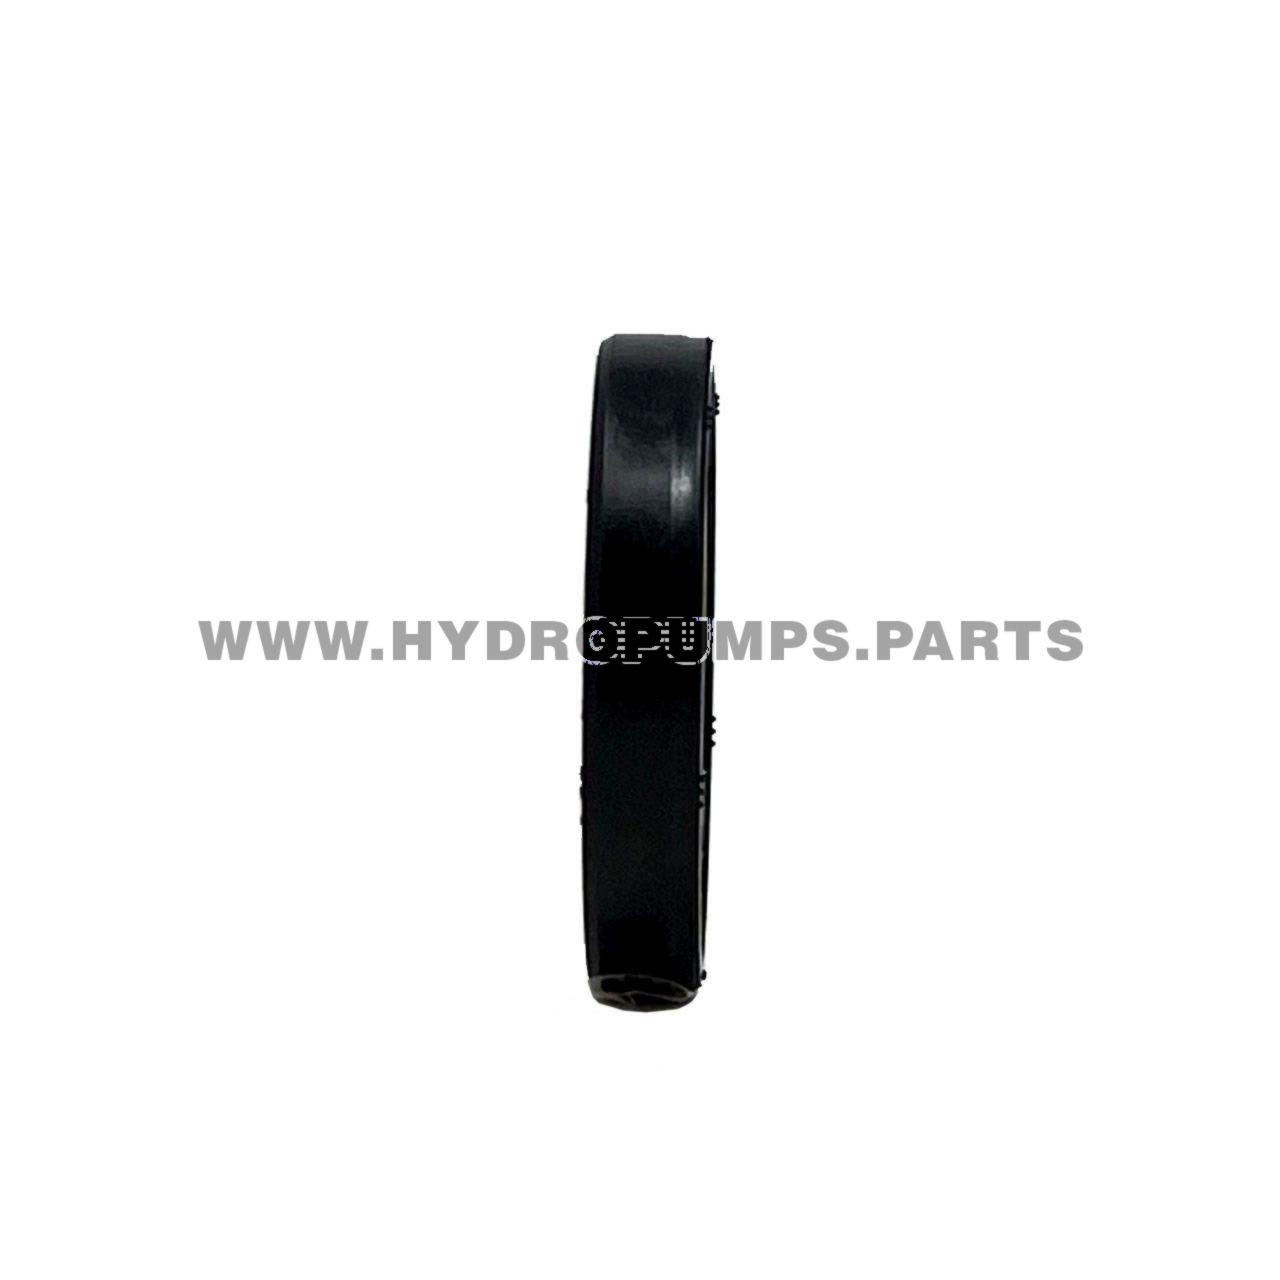 Hydro Gear 51161 - Seal 17 X 40 X 7 Lip - Image 4